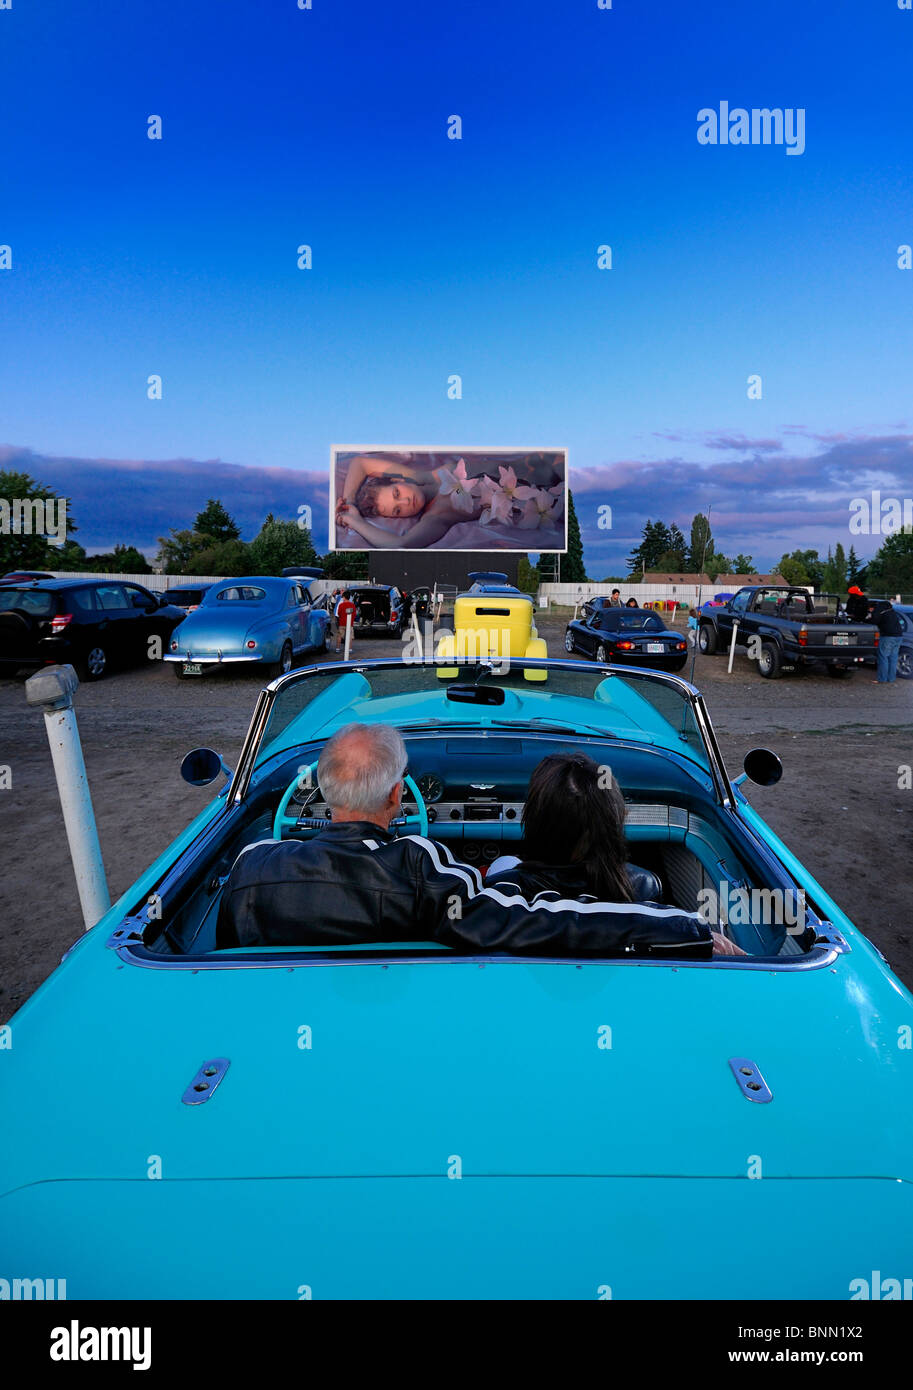 man woman couple classic car 1955 T-Bird Motor Vu Drive In Dallas Oregon USA cinema parking - Stock Image